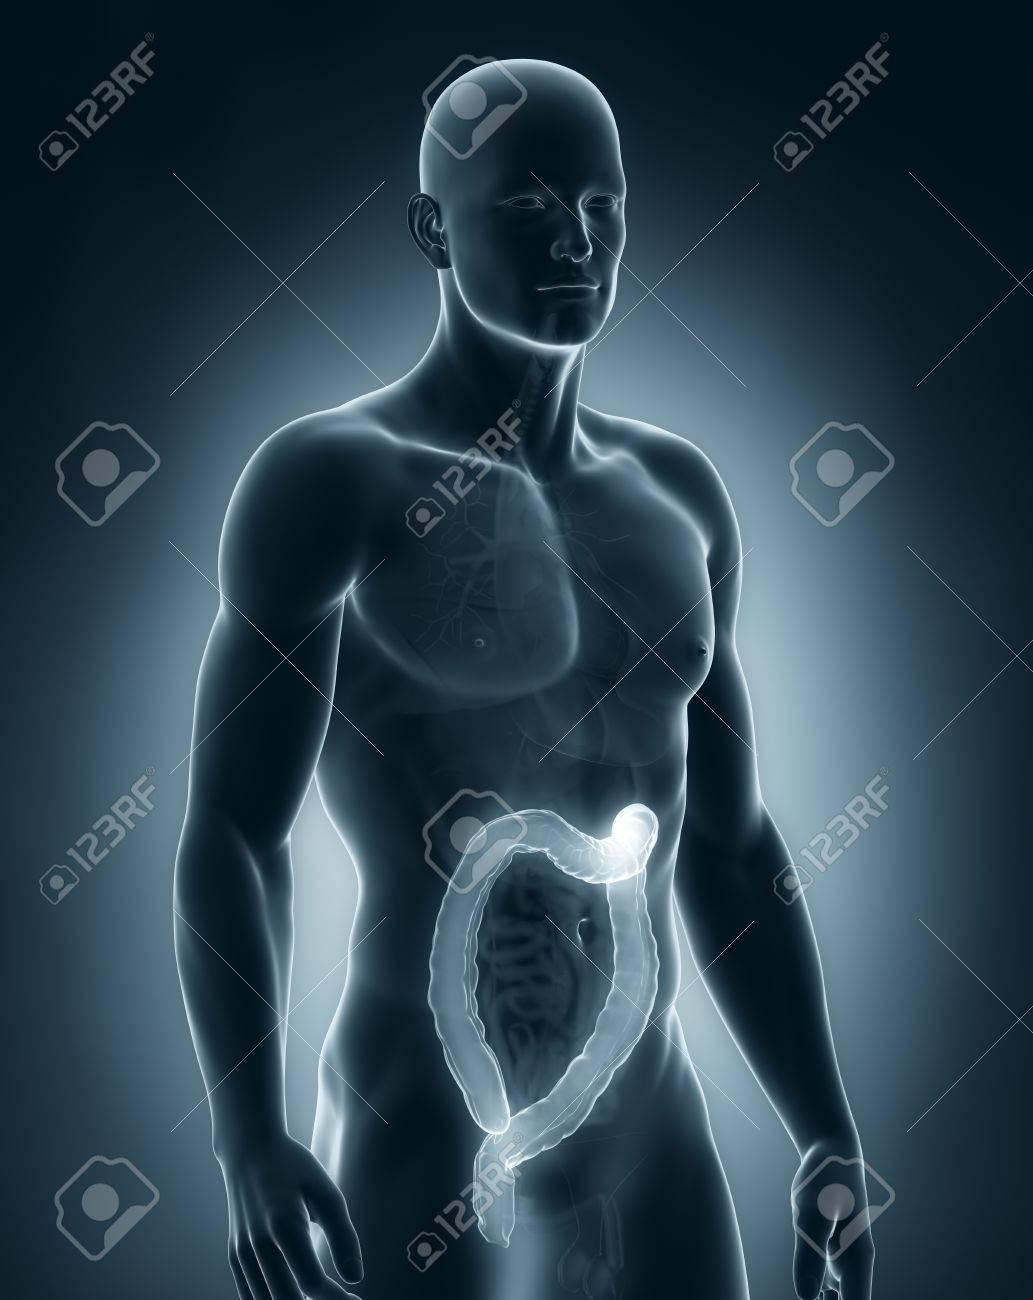 Man colon natomy Stock Photo - 21789257